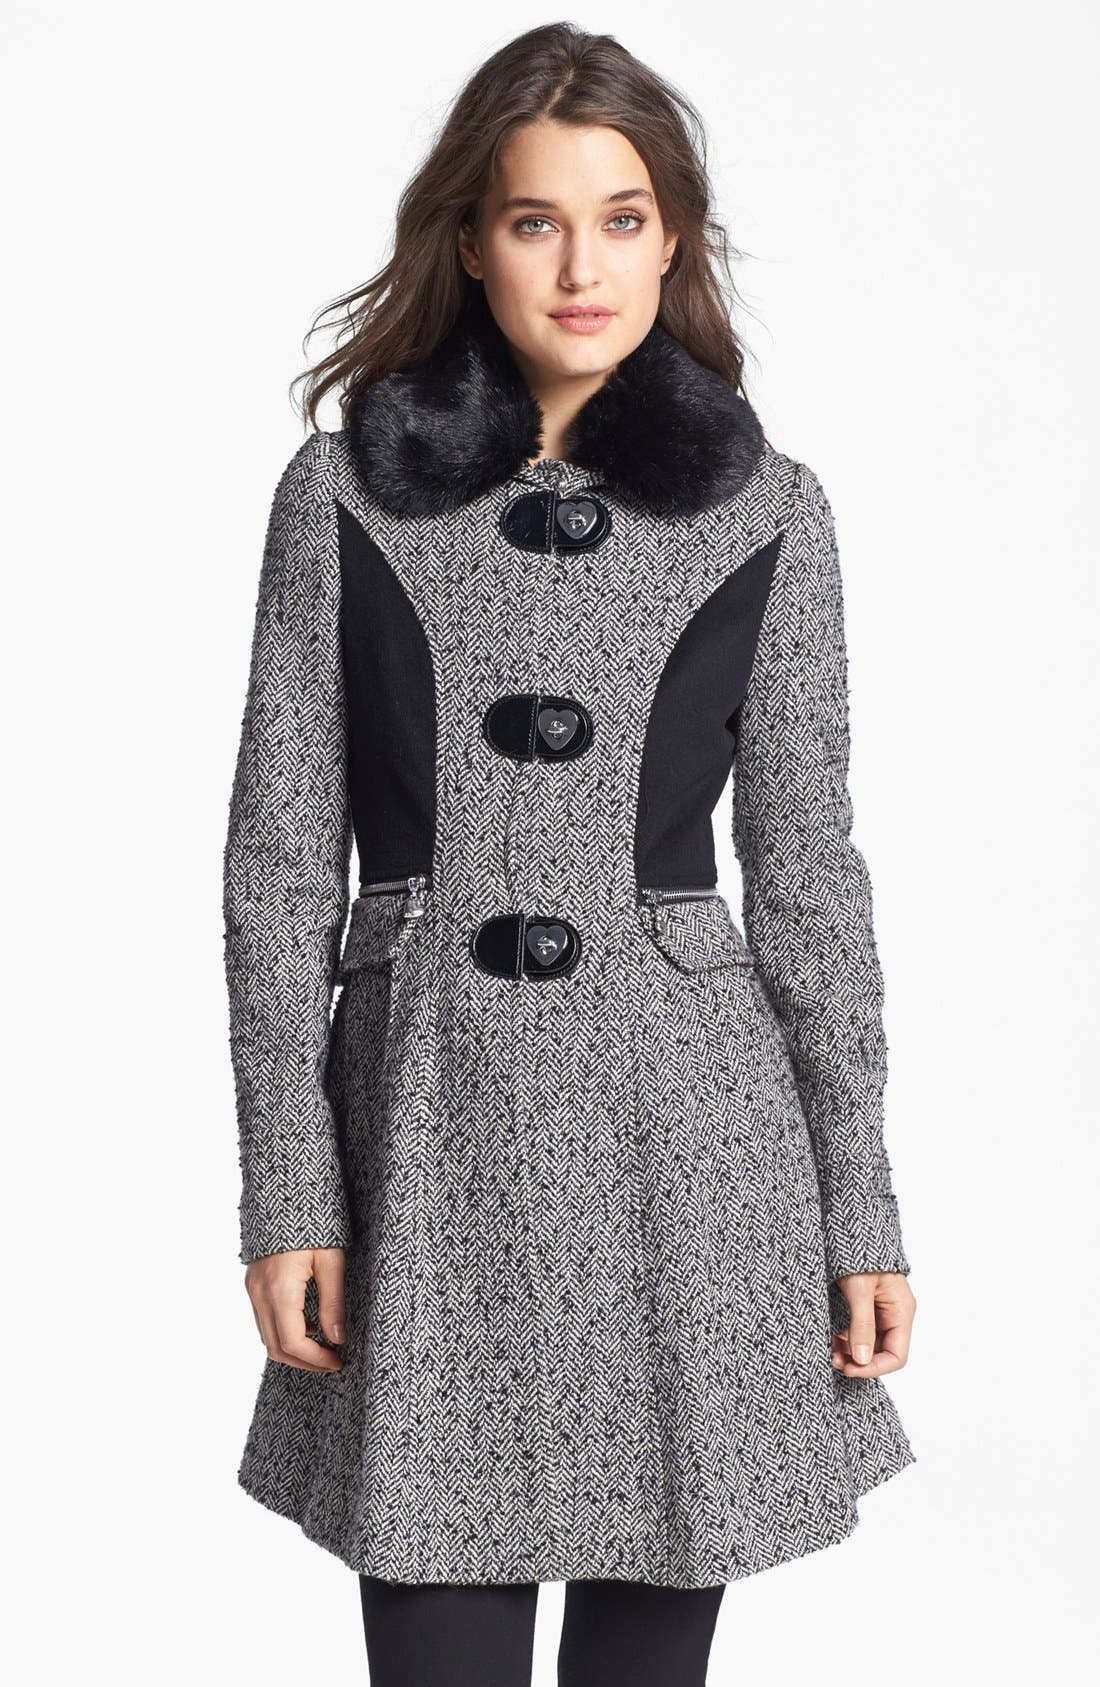 Alternate Image 1 Selected - Betsey Johnson Faux Fur Collar Tweed Coat